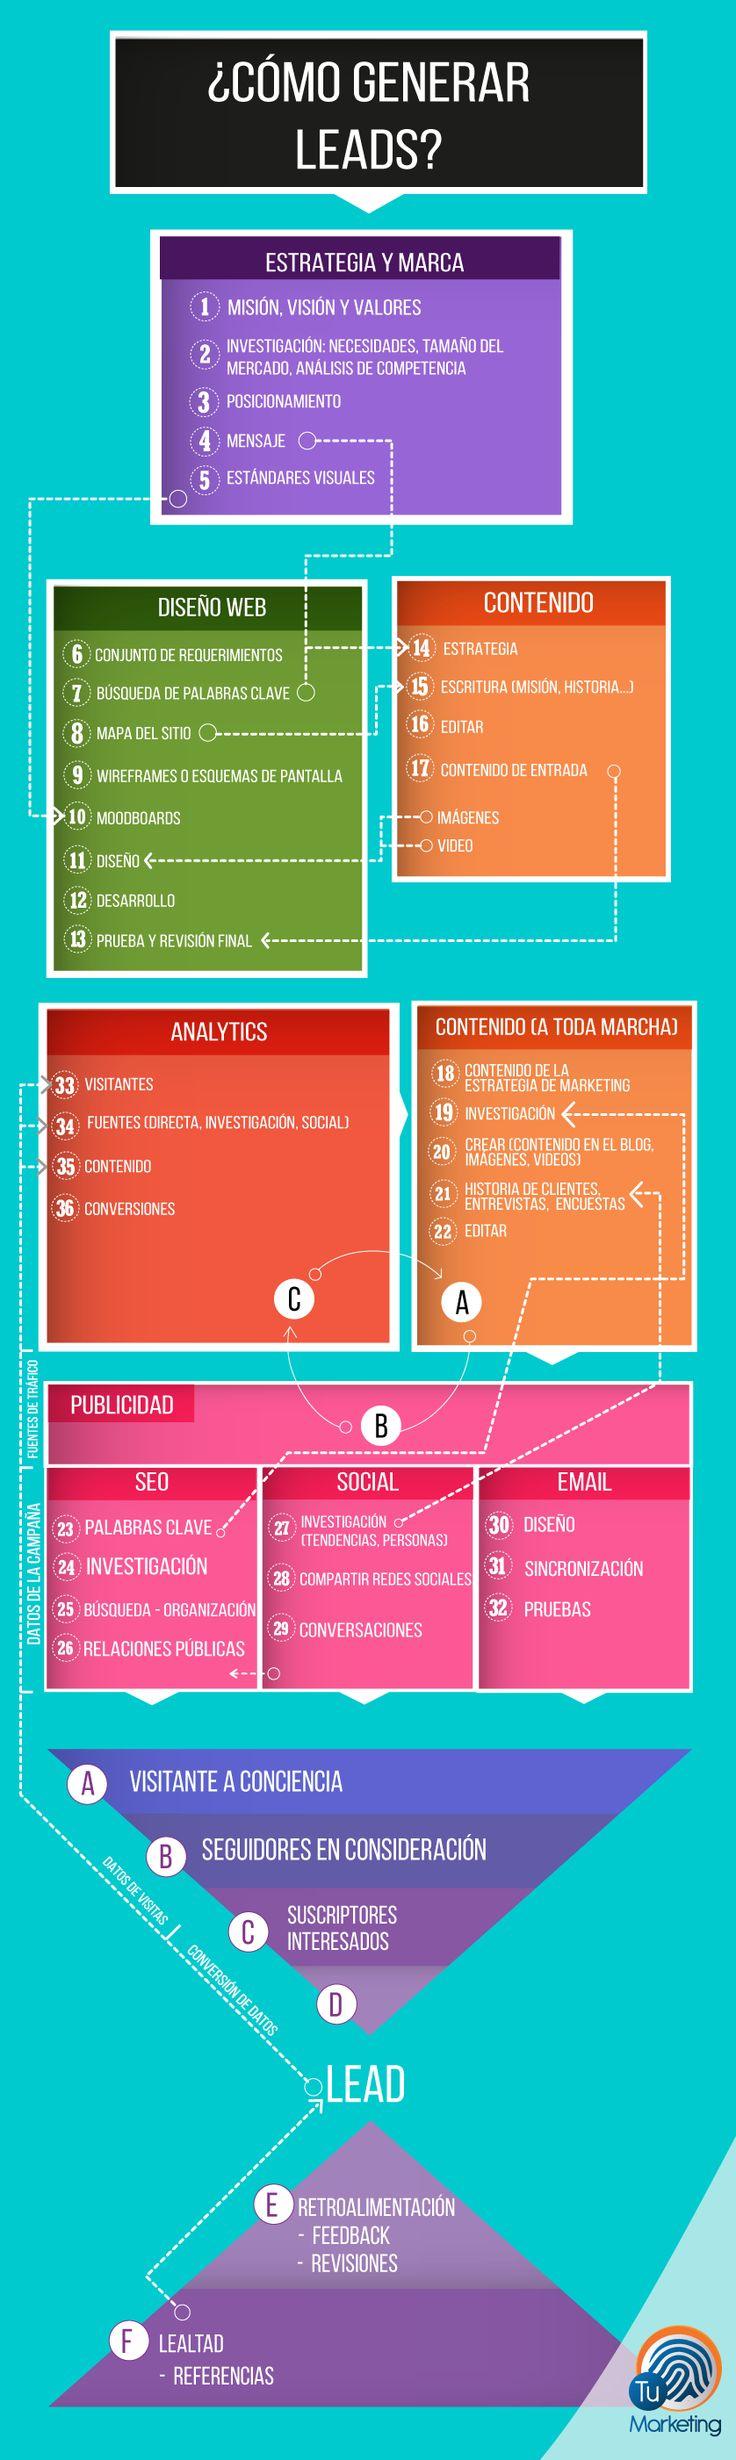 Cómo generar Leads #infografia #infographic #marketing